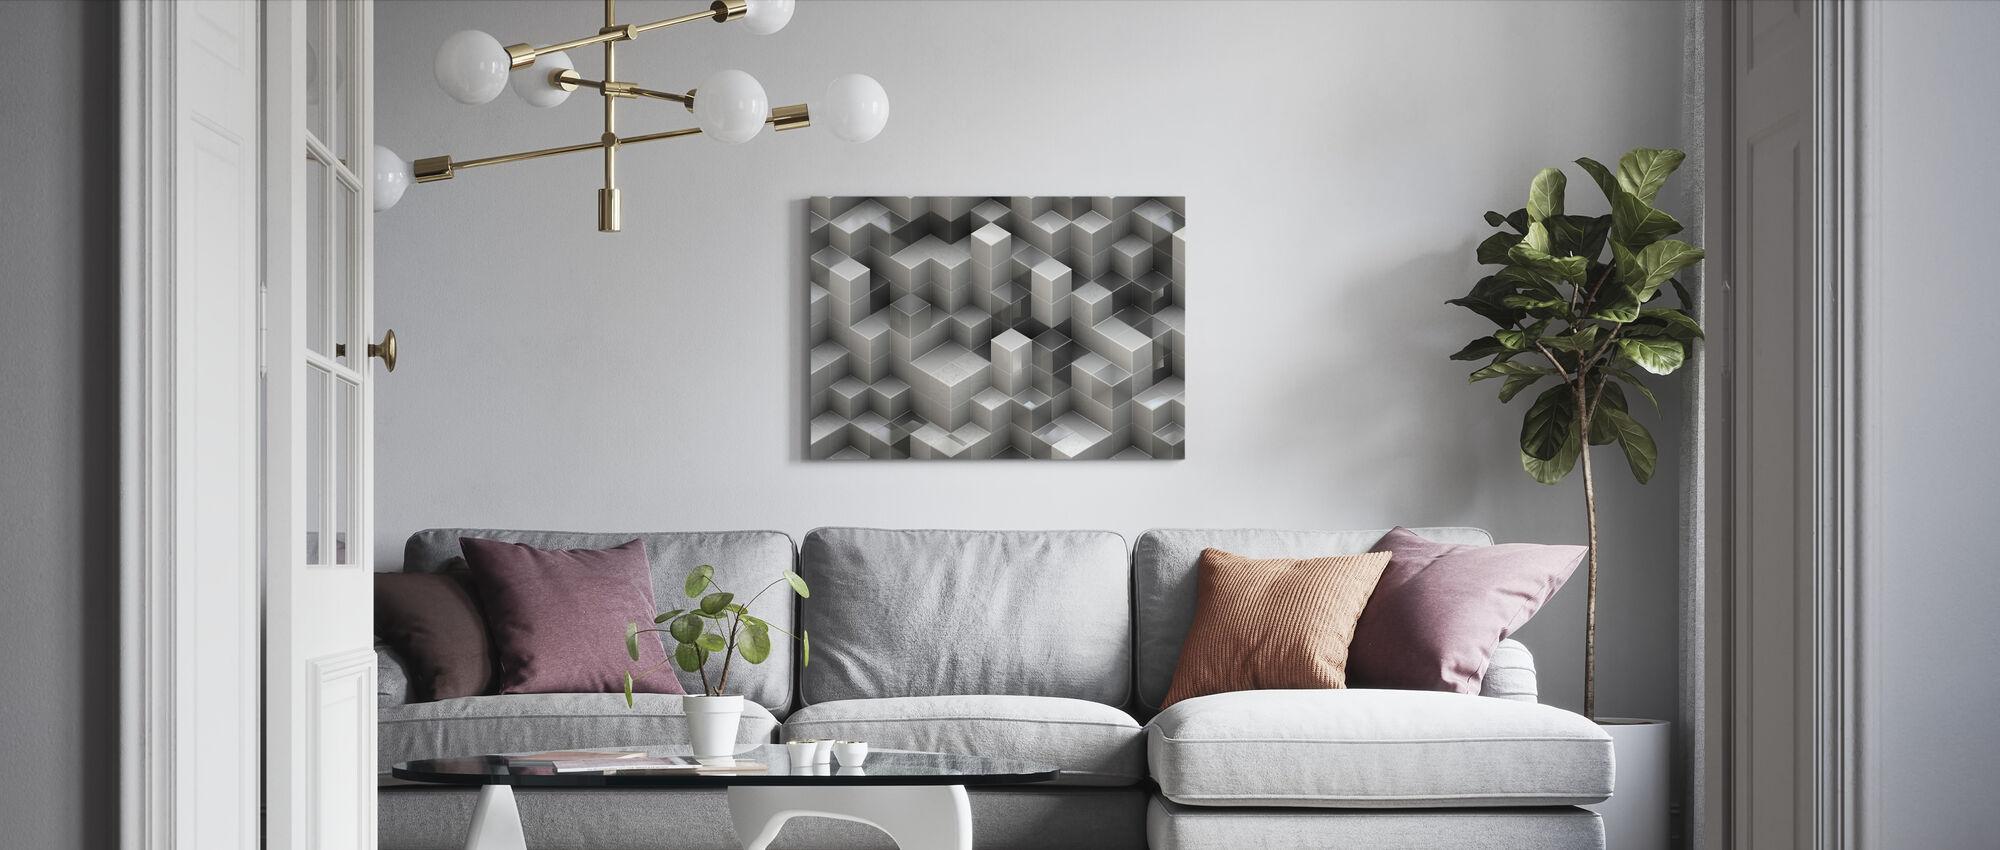 3D Konstruktion - Canvastavla - Vardagsrum